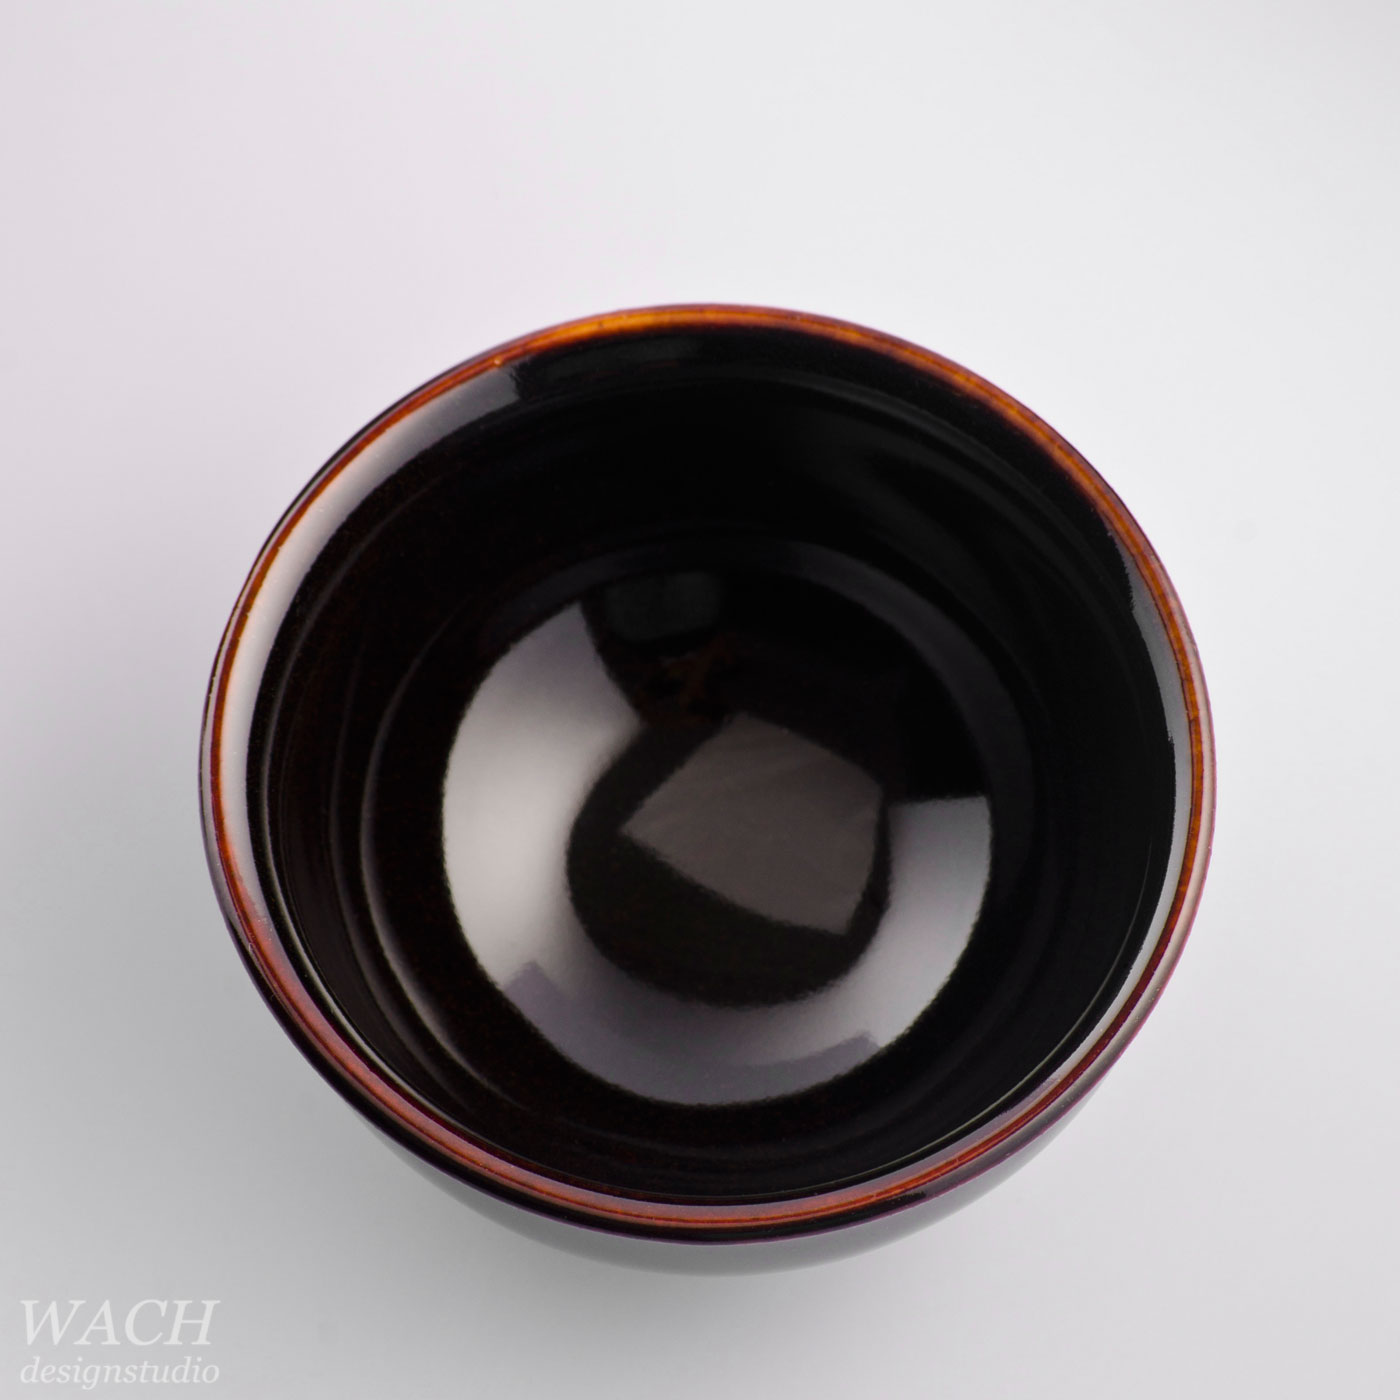 Vietnamese handcrafted ceramic tea cup